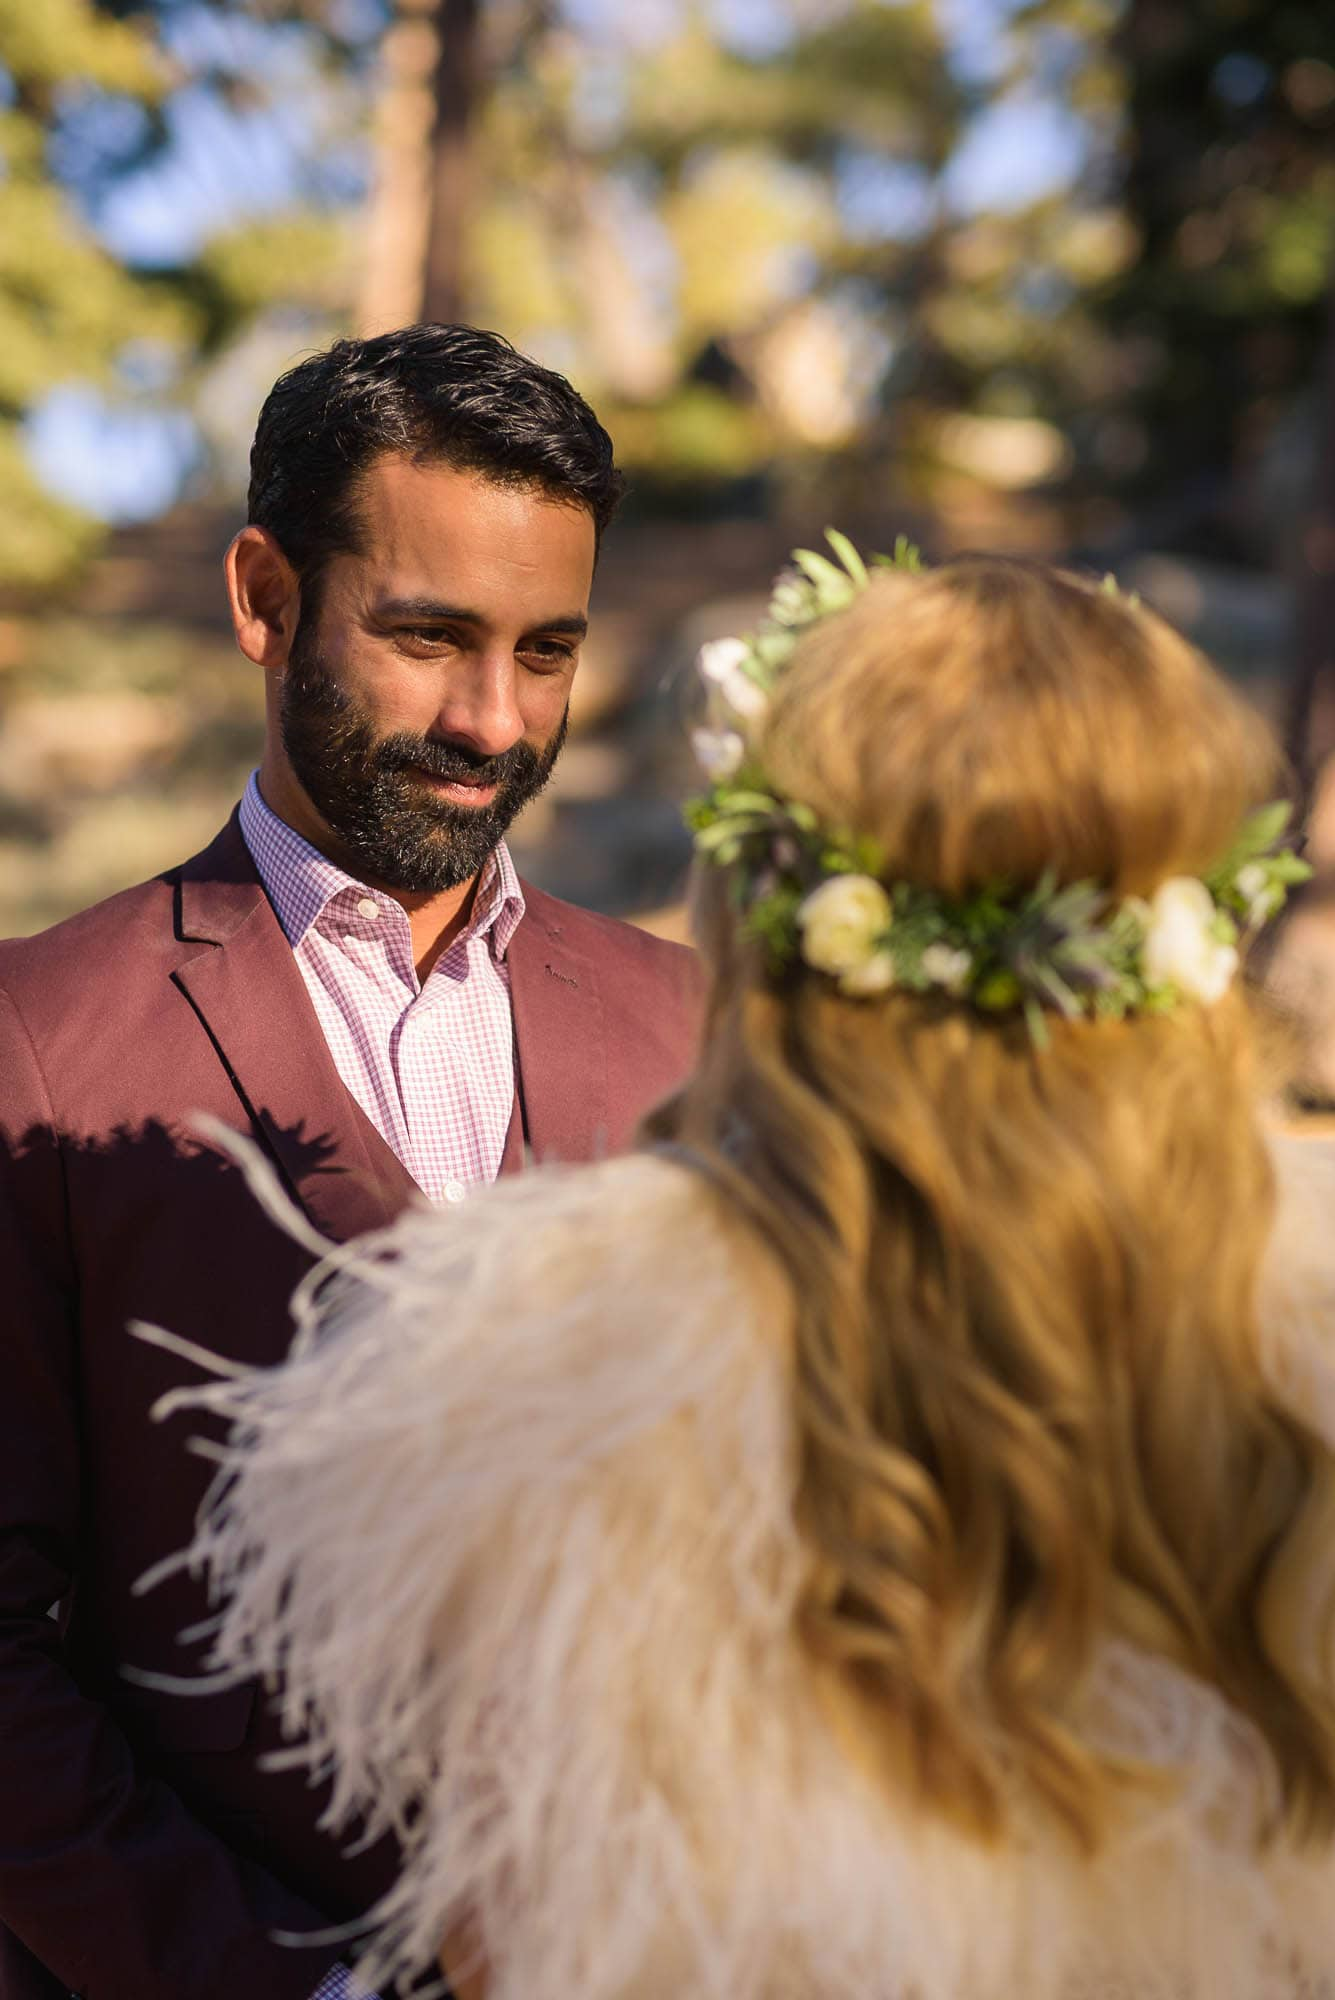 019_Alan_and_Heidi_Wedding_Natalie_Mike